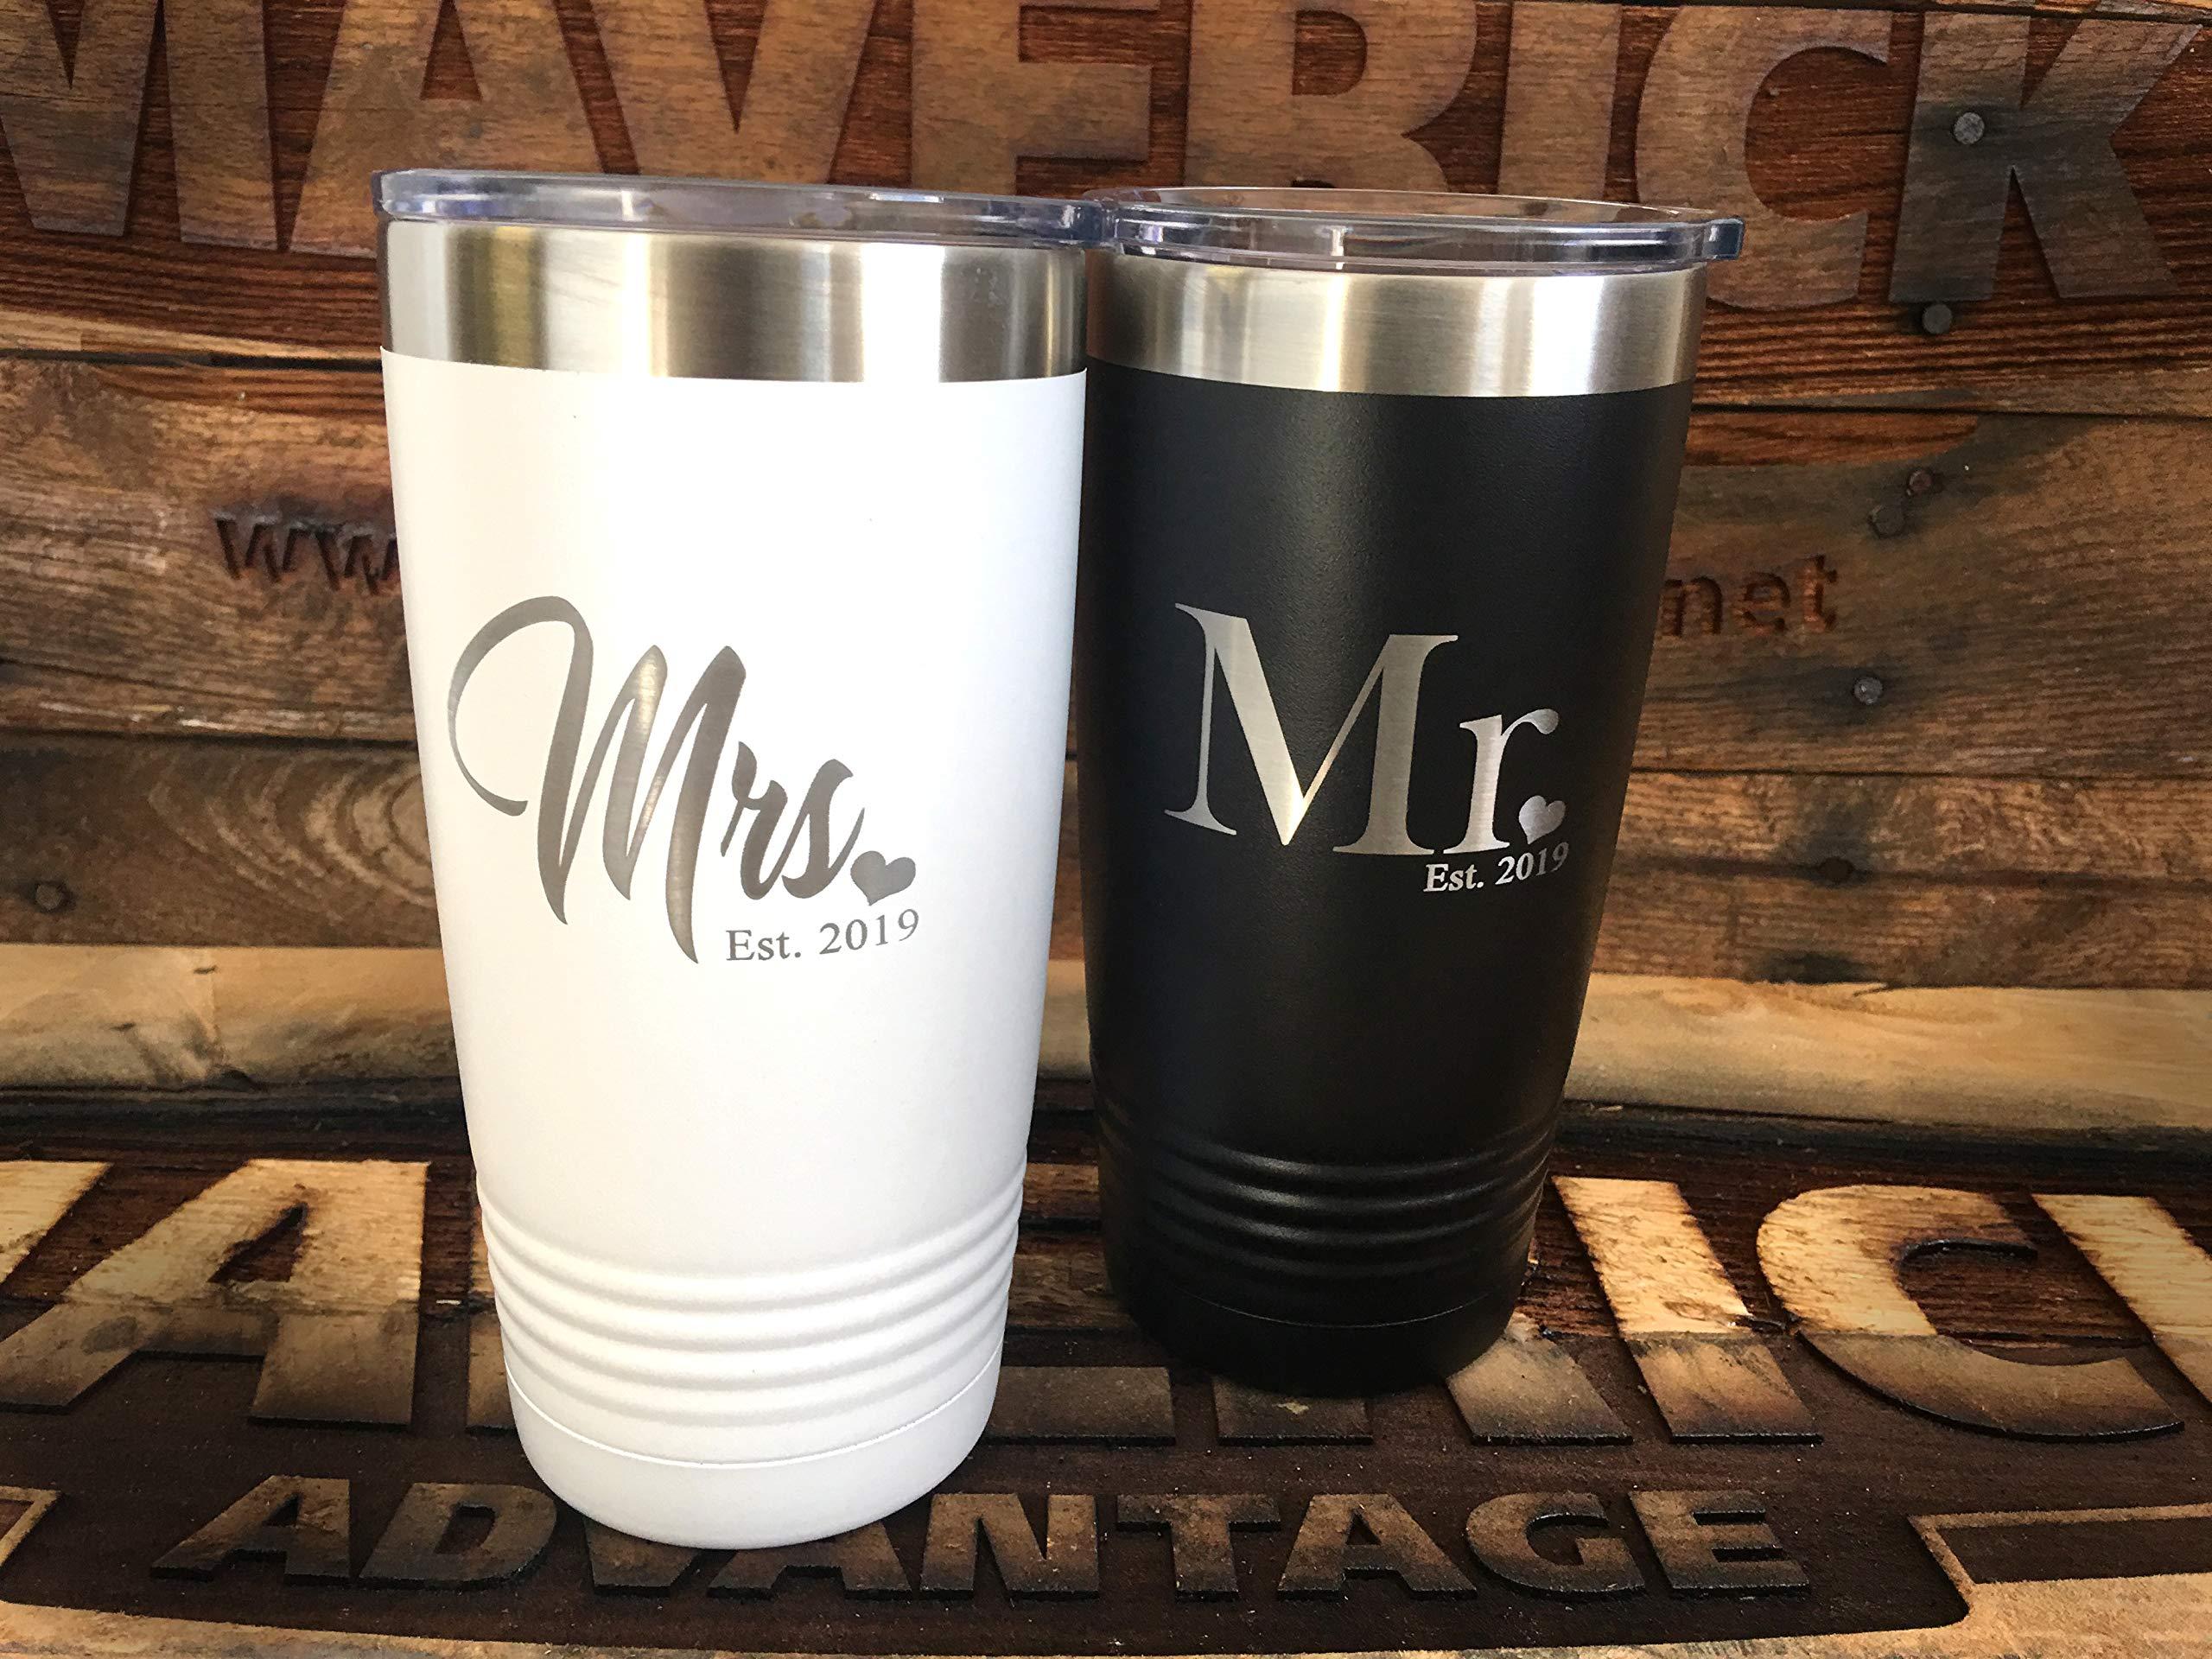 Set of 2-20oz Insulated''MR. & Mrs.'' Travel Mug l Wedding Gift l Laser Engraved l Powder Coated by Maverick Advantage